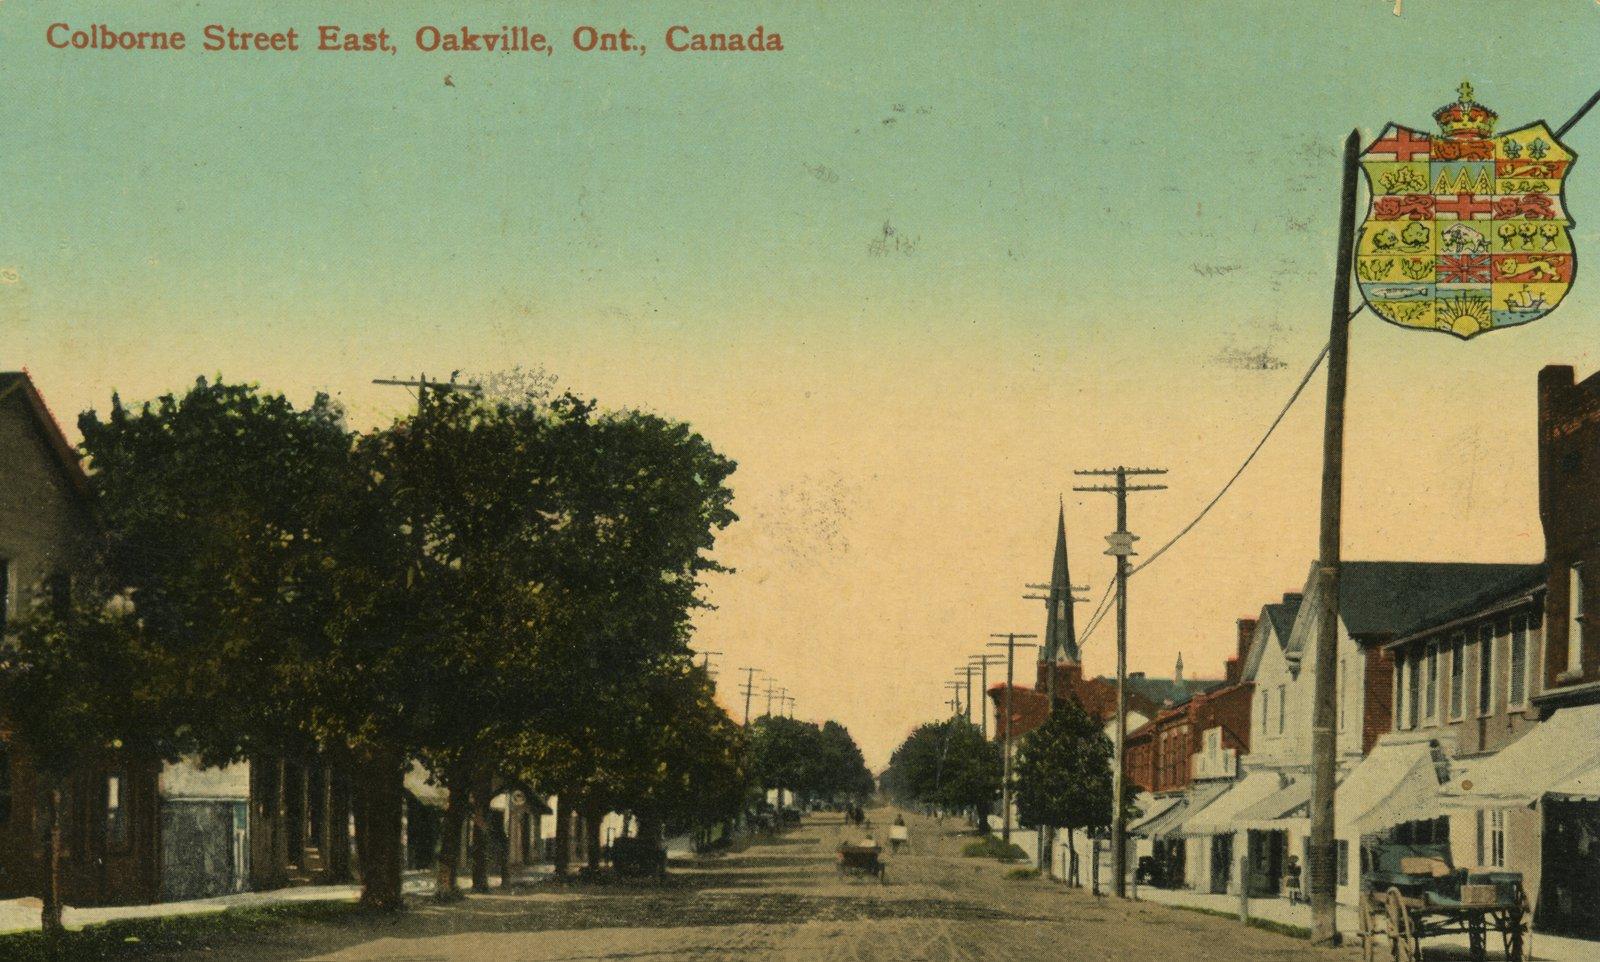 Colborne Street East, Oakville, Ontario